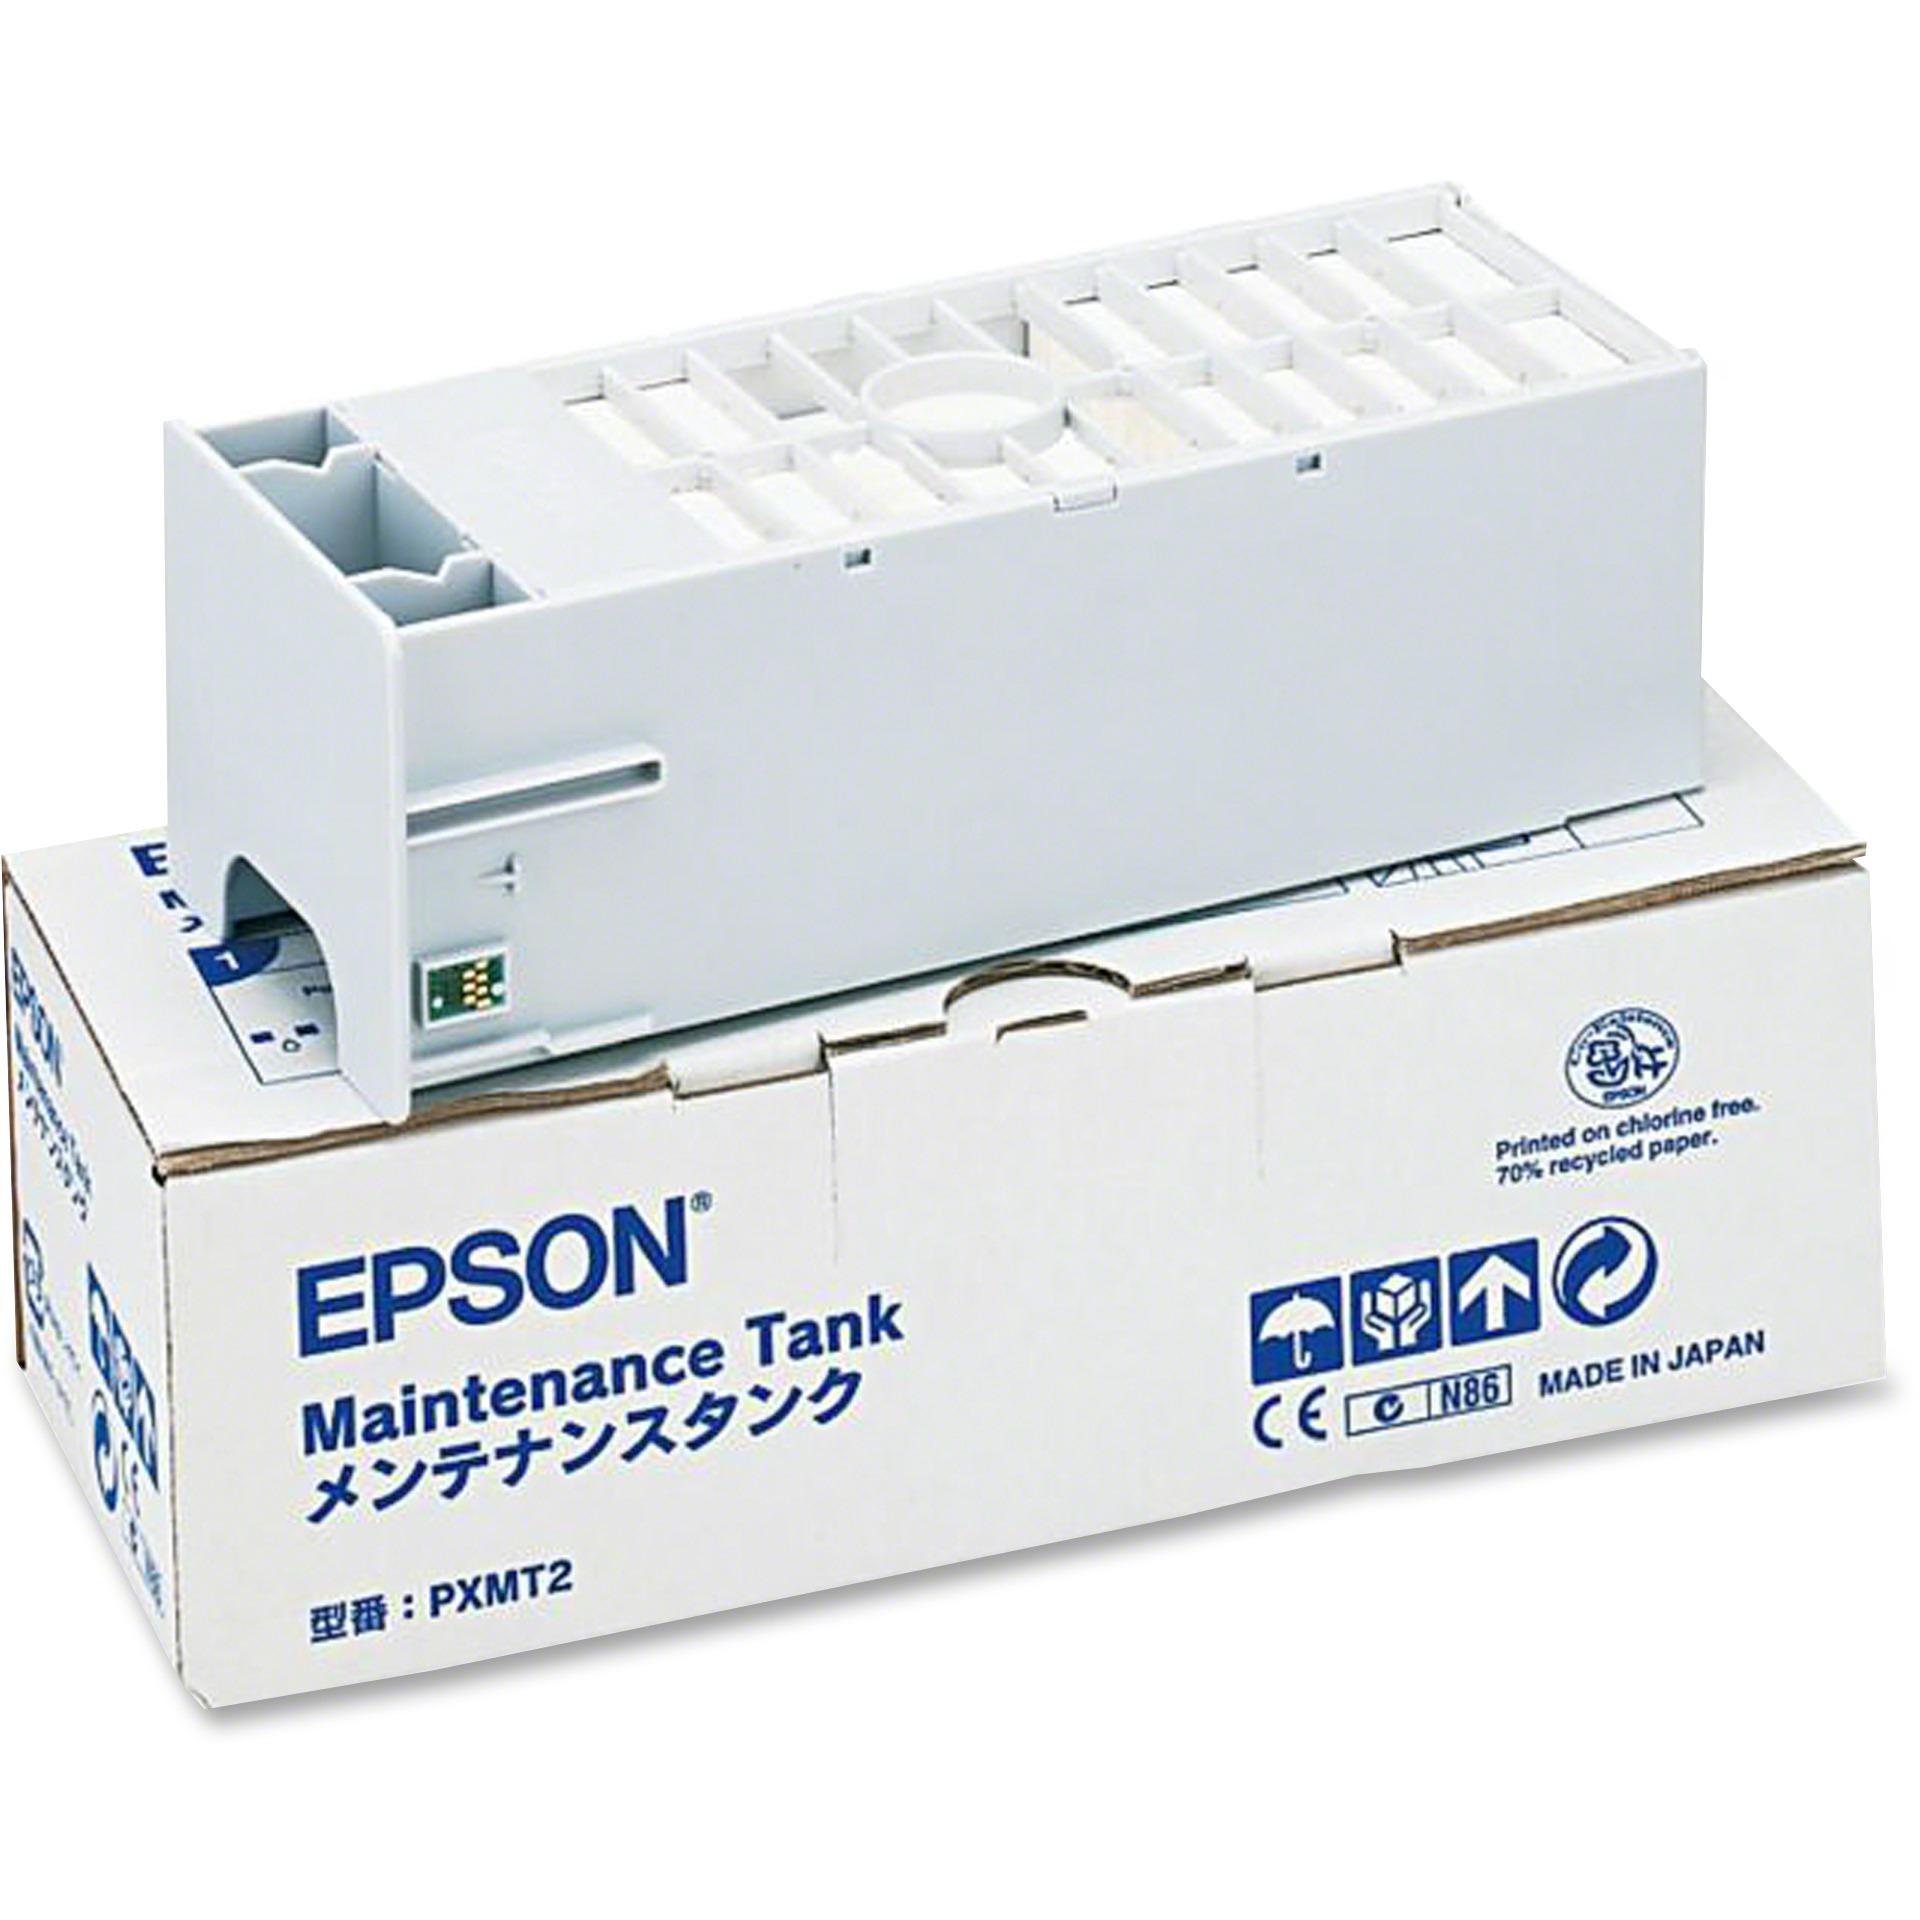 Epson Ink Maintenance Tank by Epson